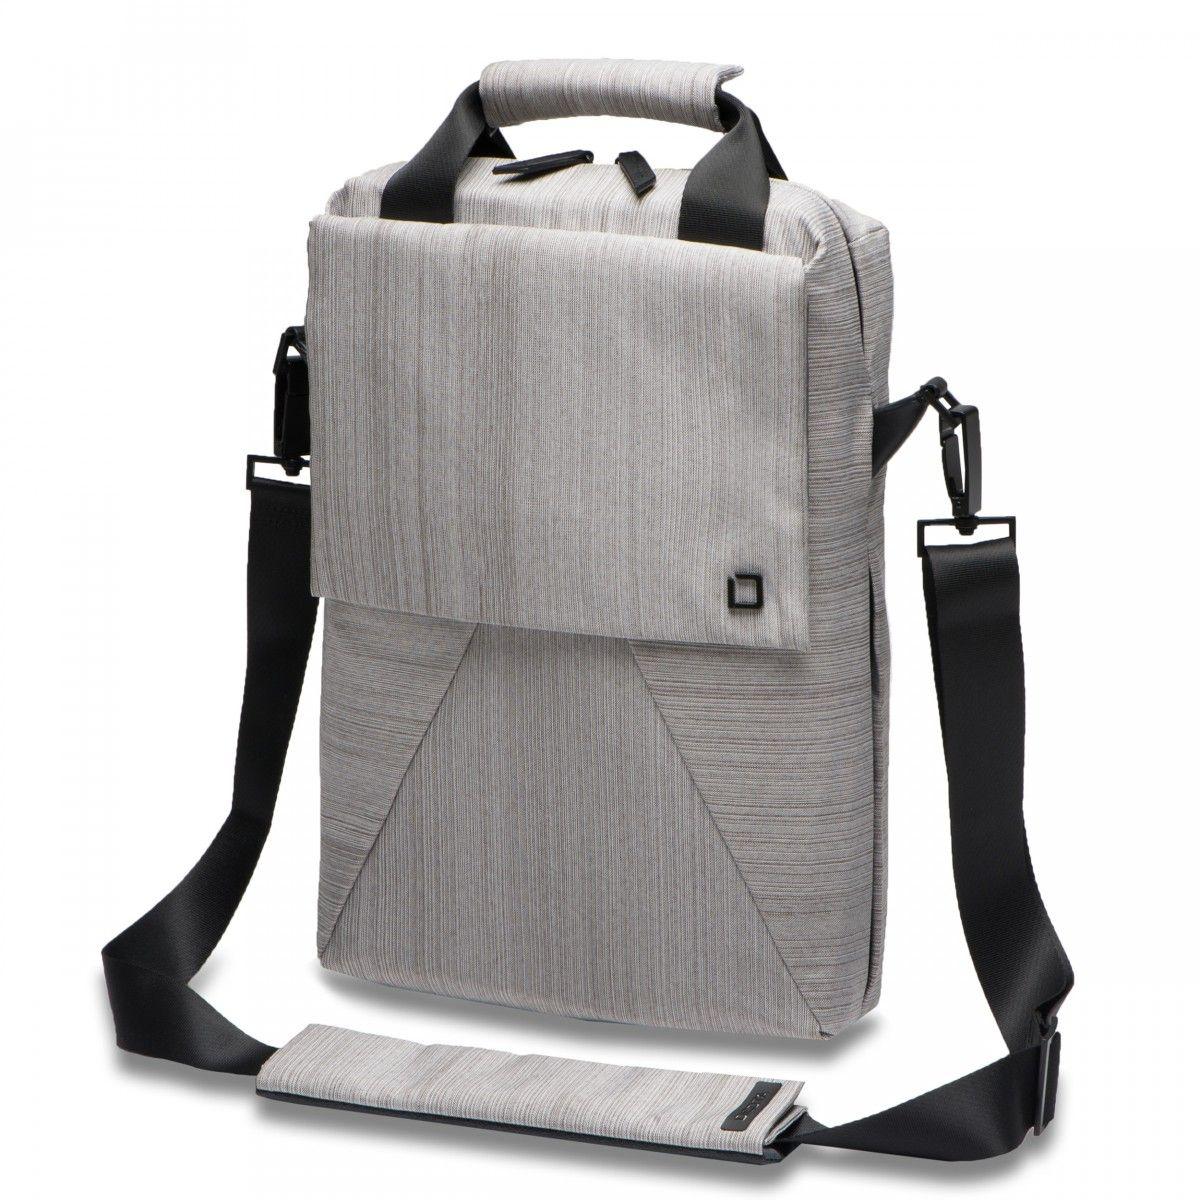 dicota bag - Google Search | Bag | Pinterest | Accessories, Search ...